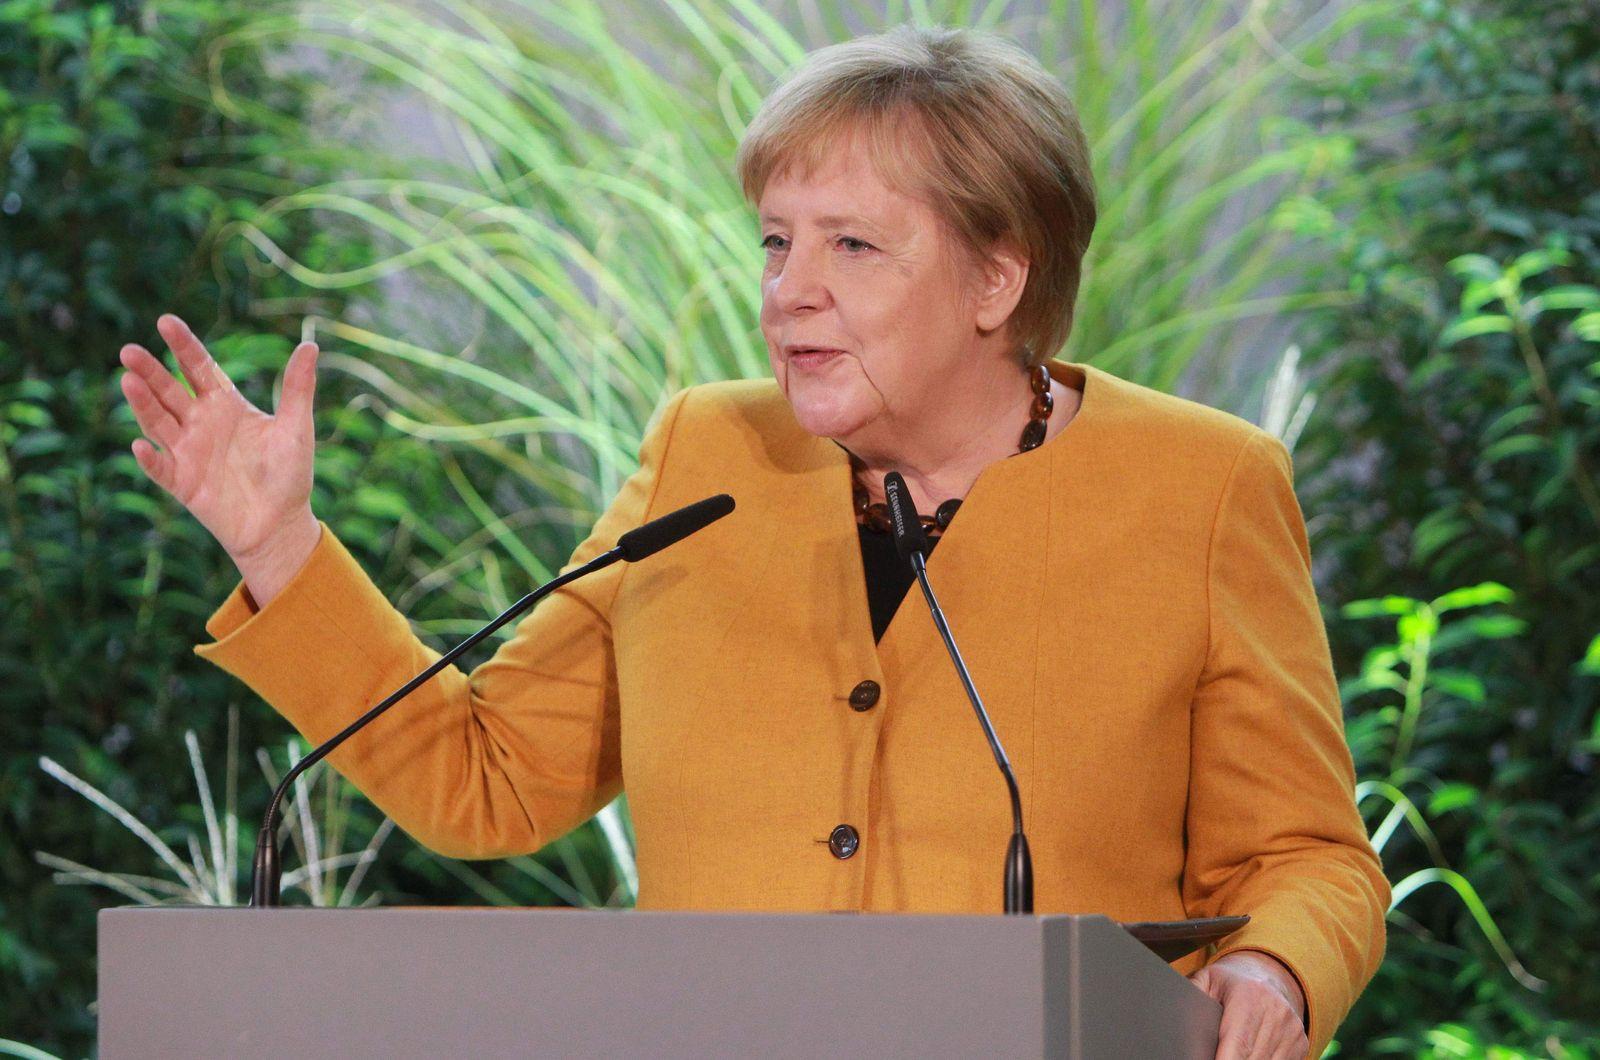 GERMANY-POLITICS-ENVIRONMENT-CLIMATE-MERKEL